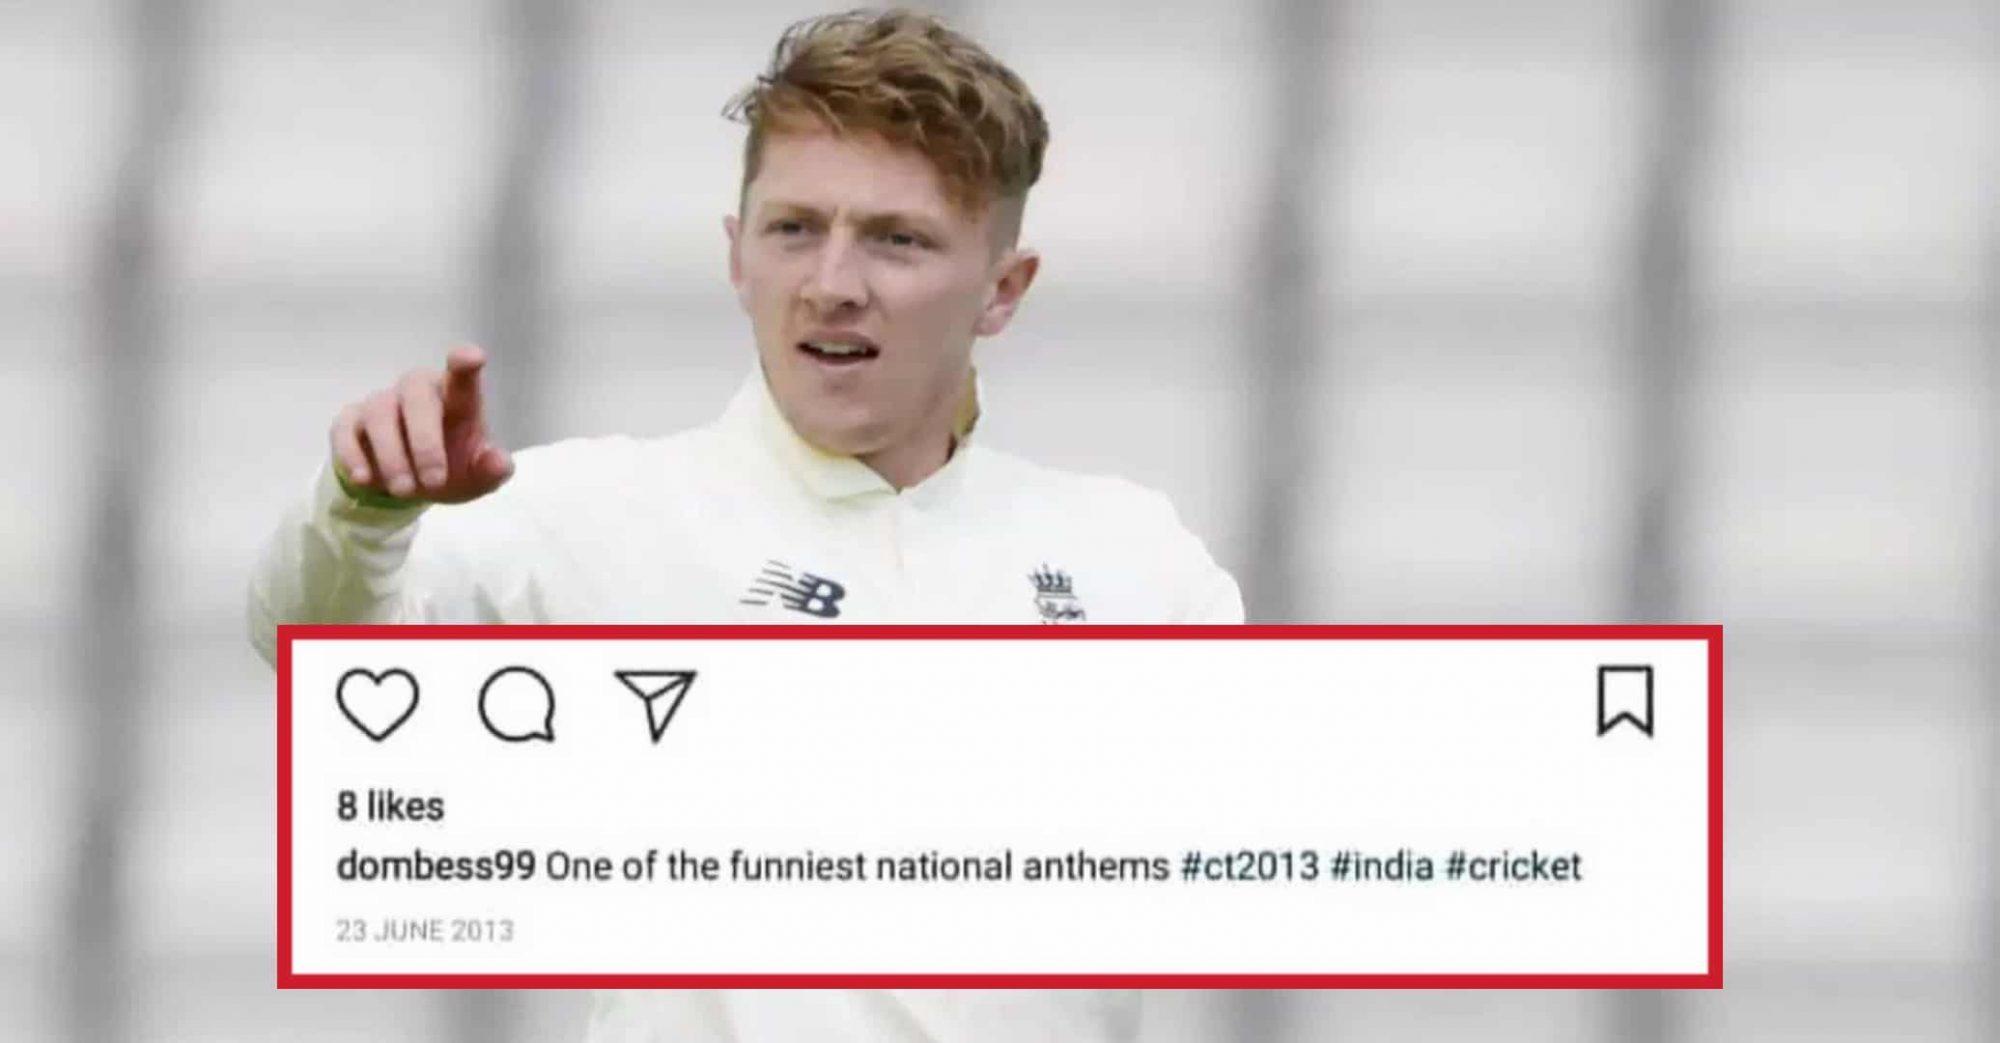 Dom Bess Mocked India's National Anthem; Post Goes Viral